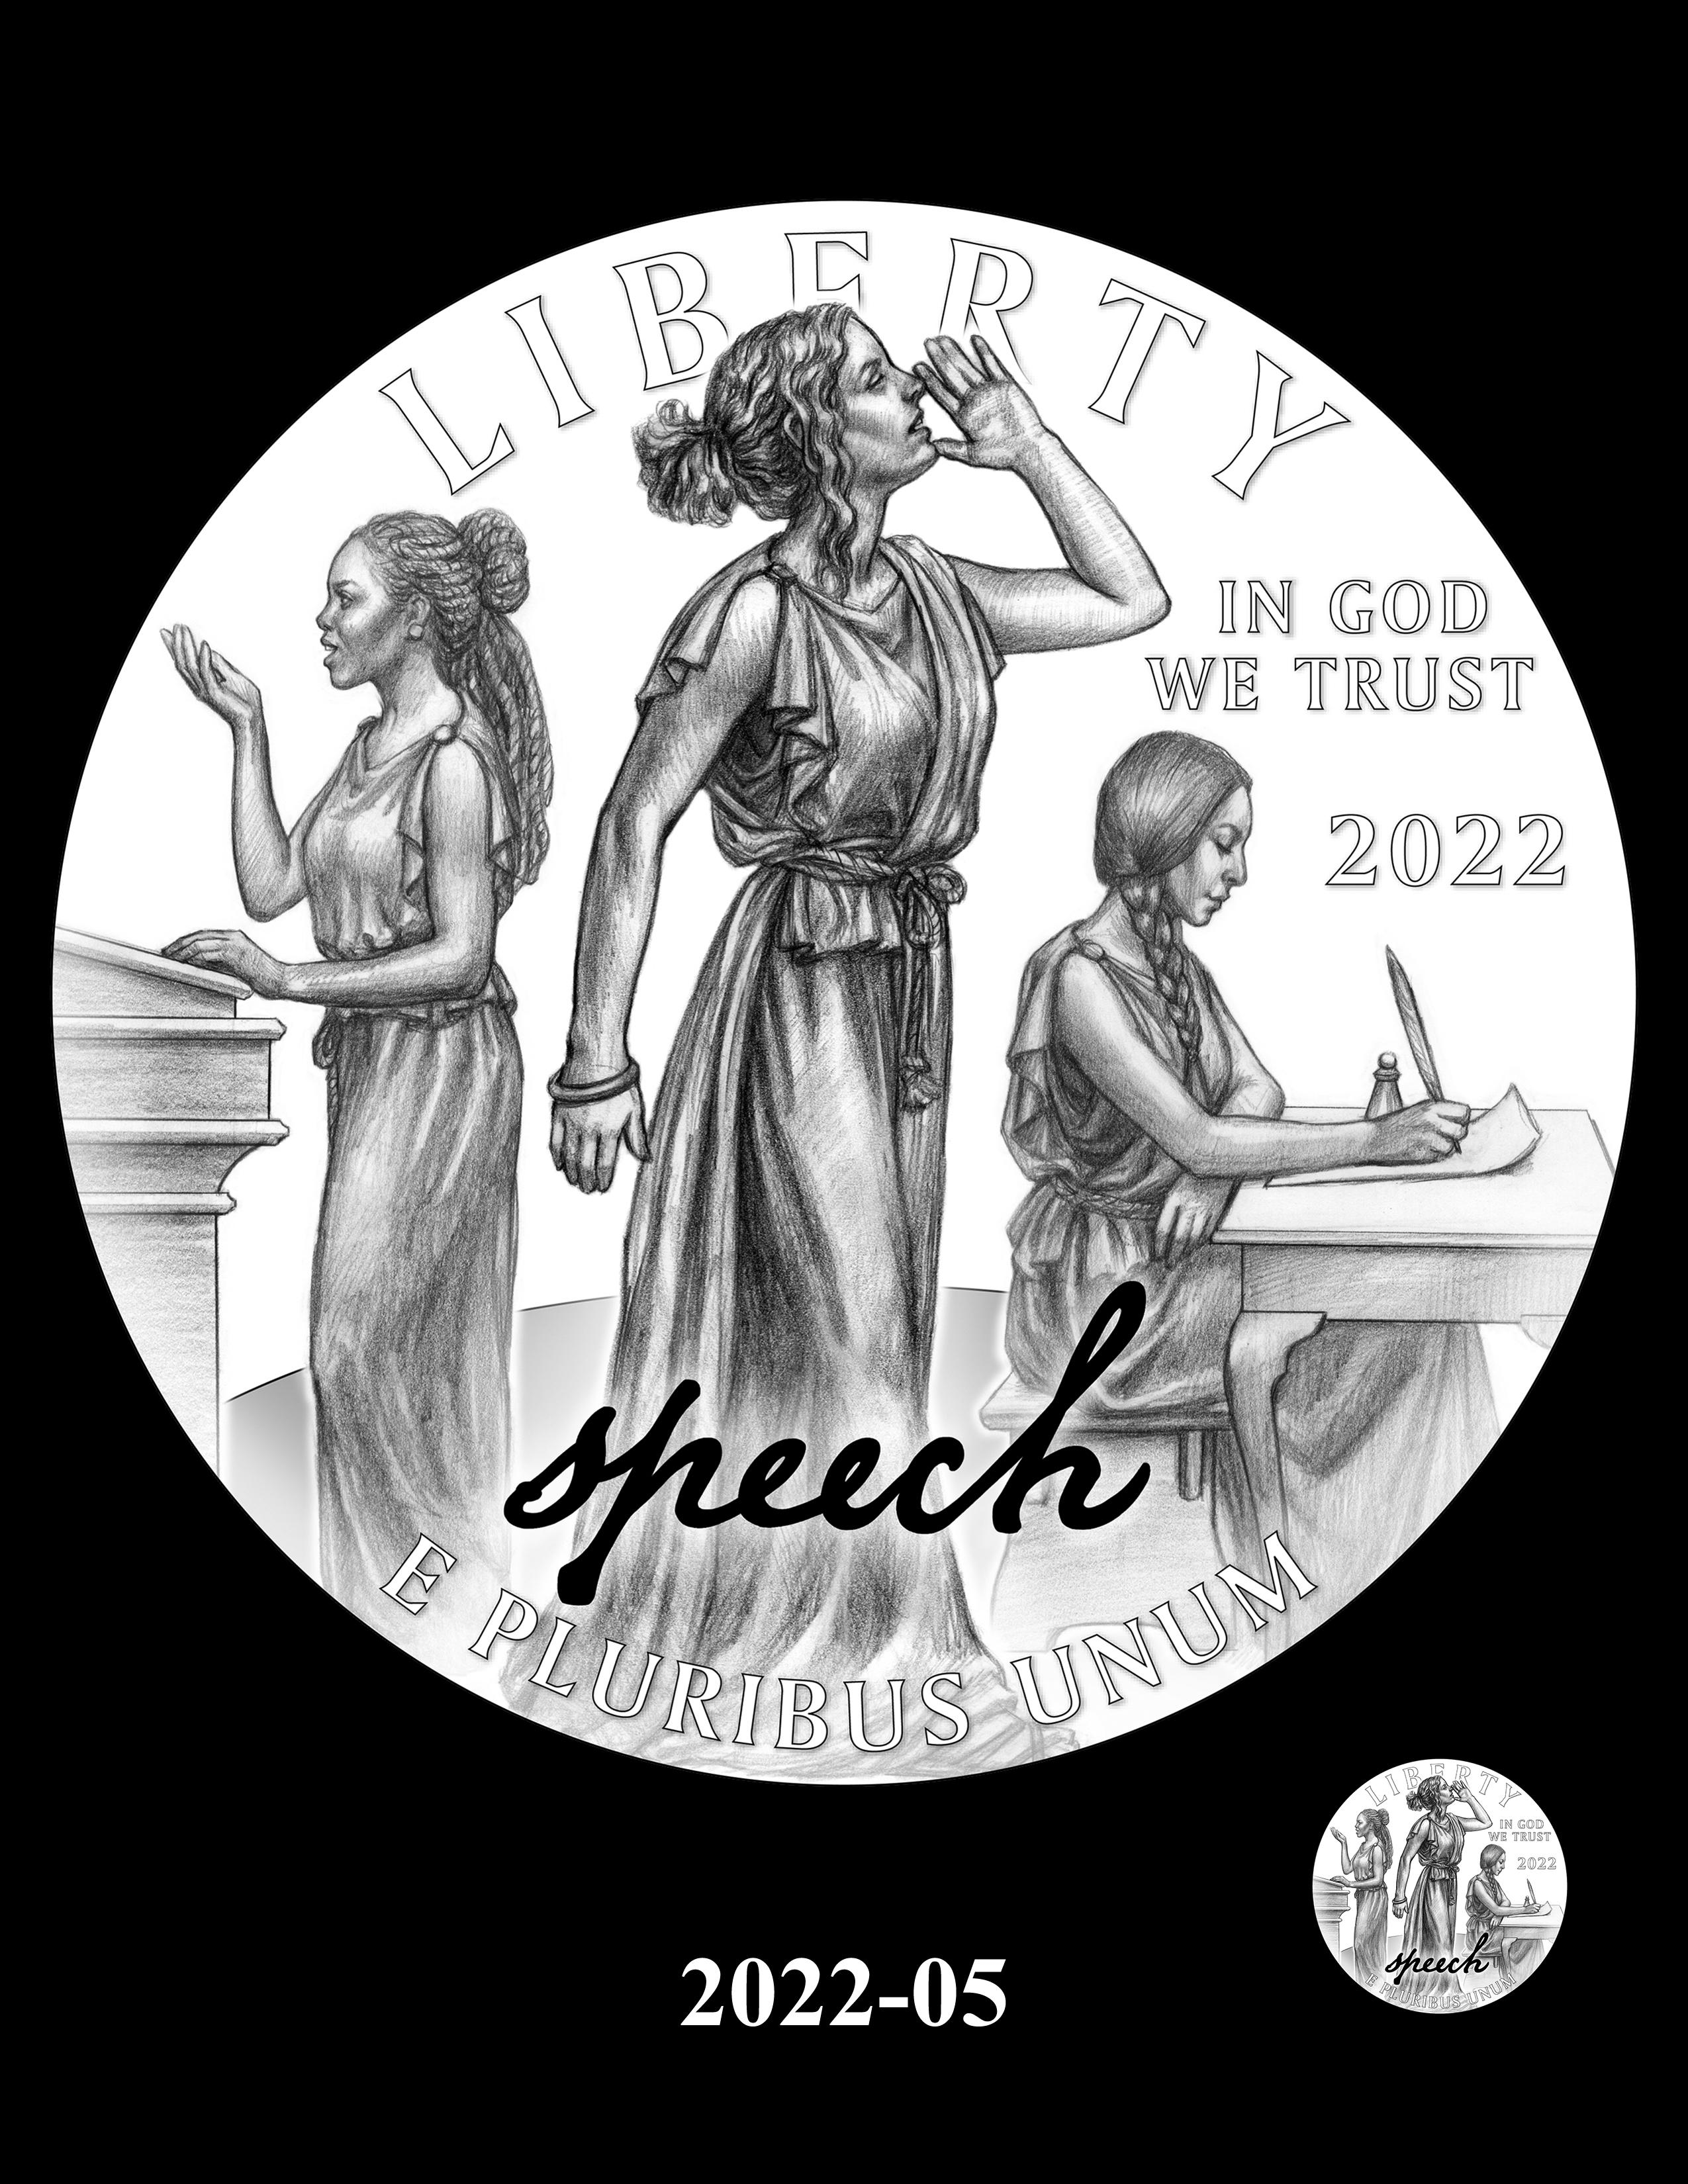 05-2022 -- 2021 - 2025 American Eagle Platinum Proof Program